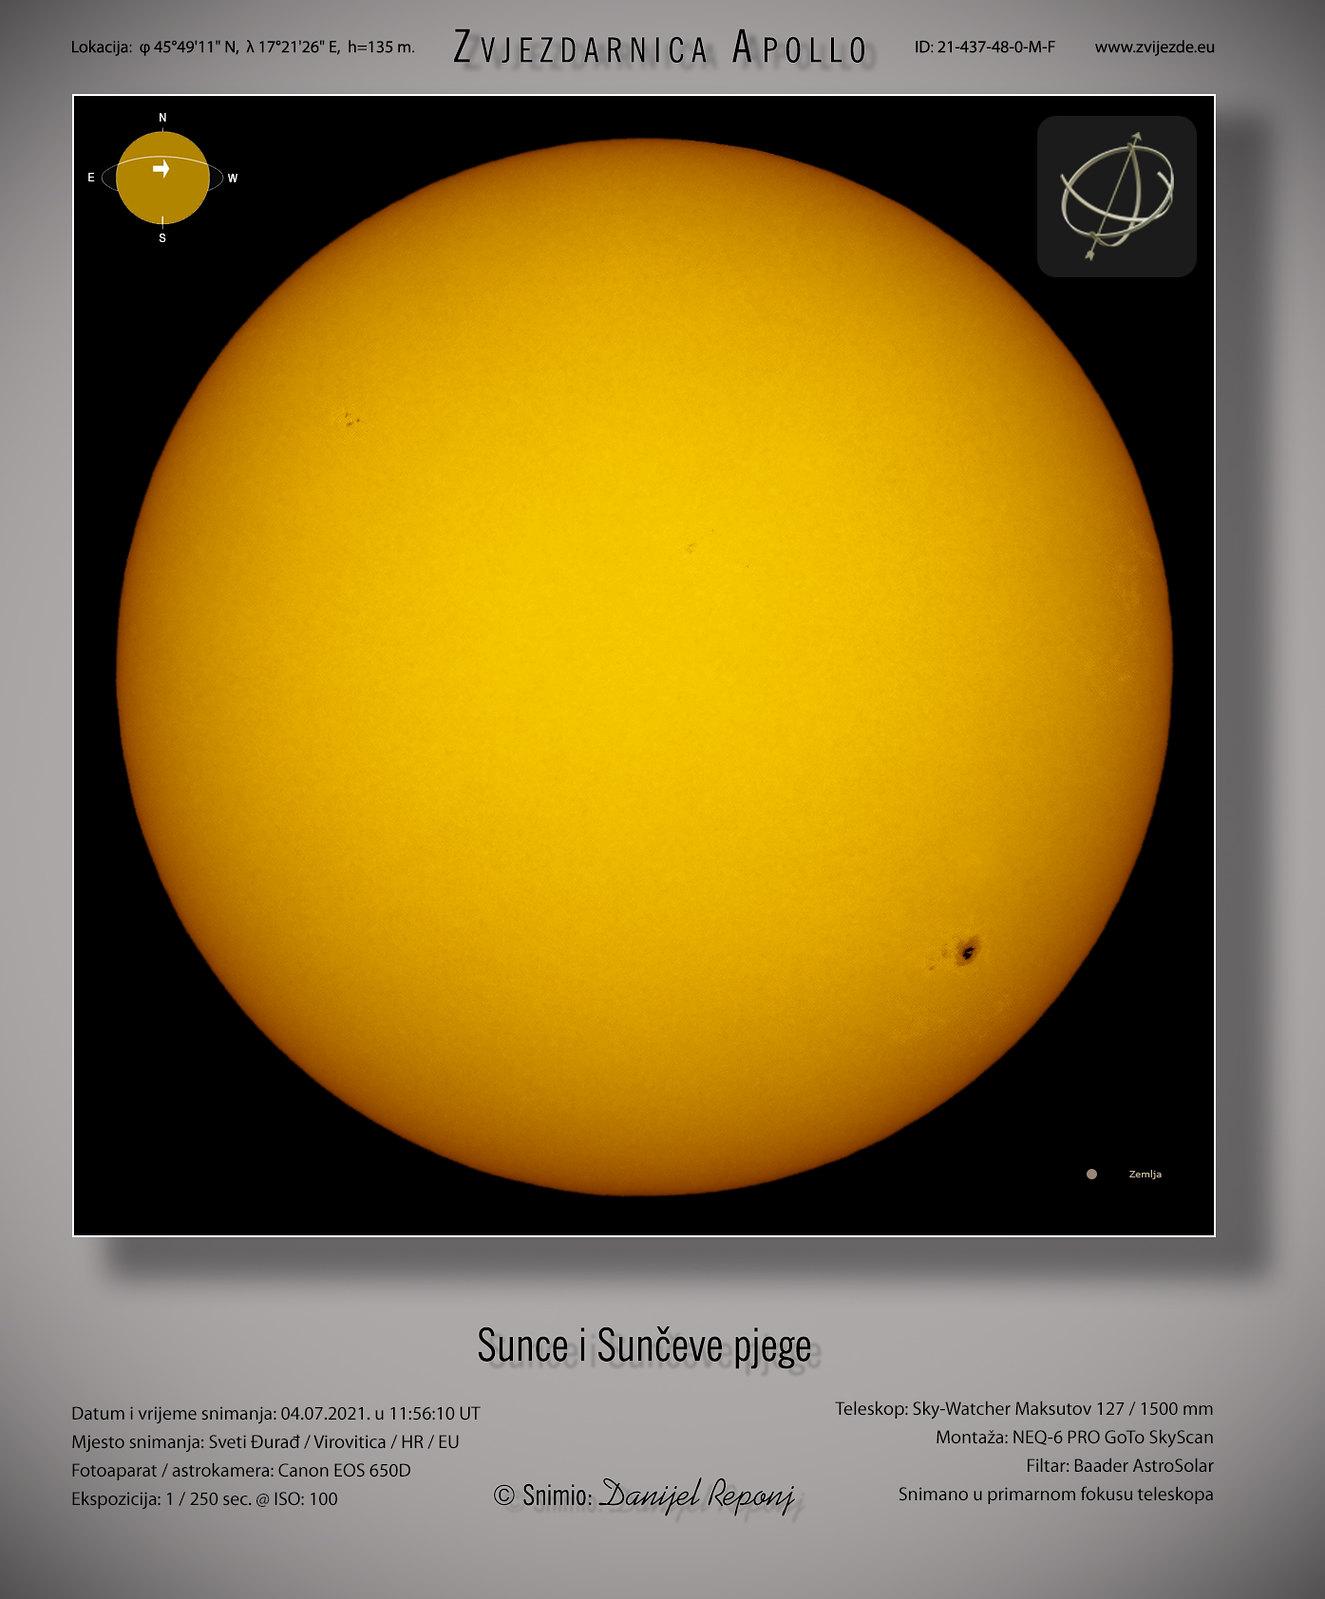 Sunce i pjege, 4.7.2021.